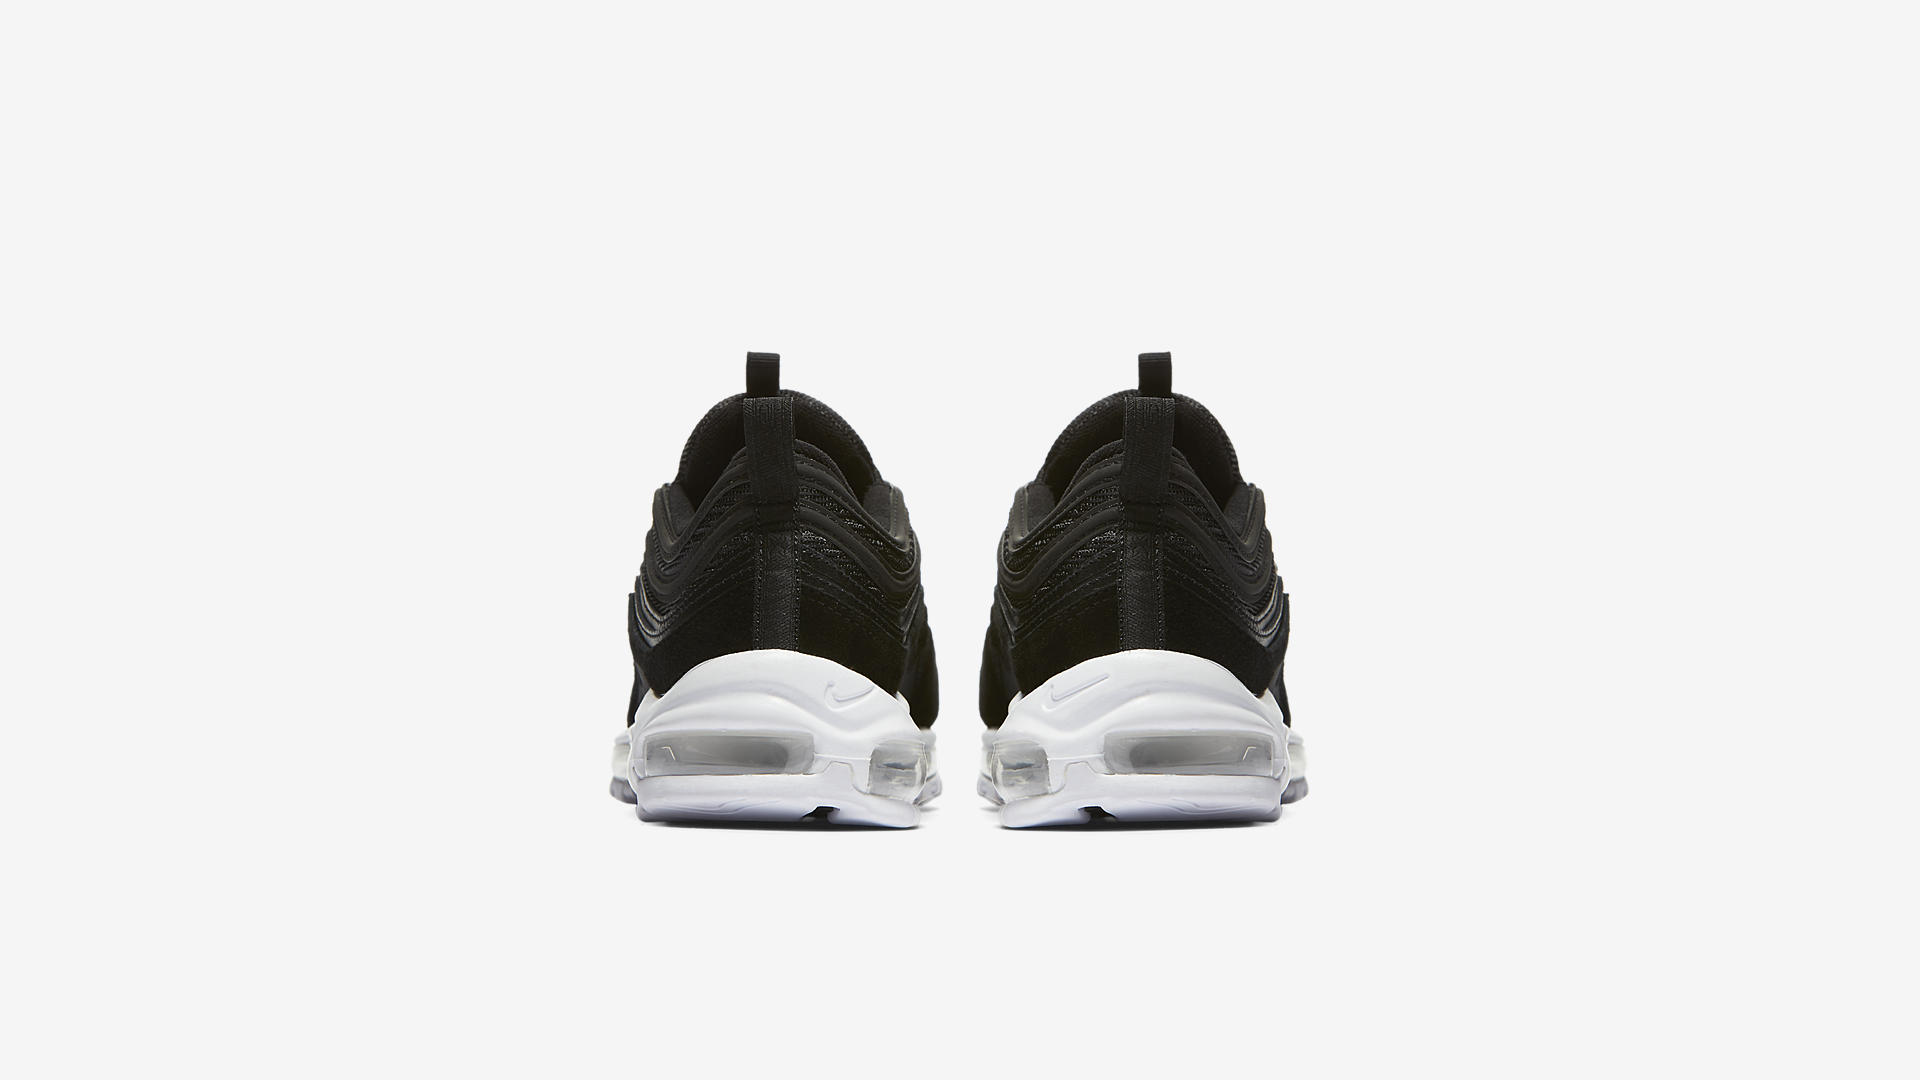 921826 003 Nike Air Max 97 Black 2